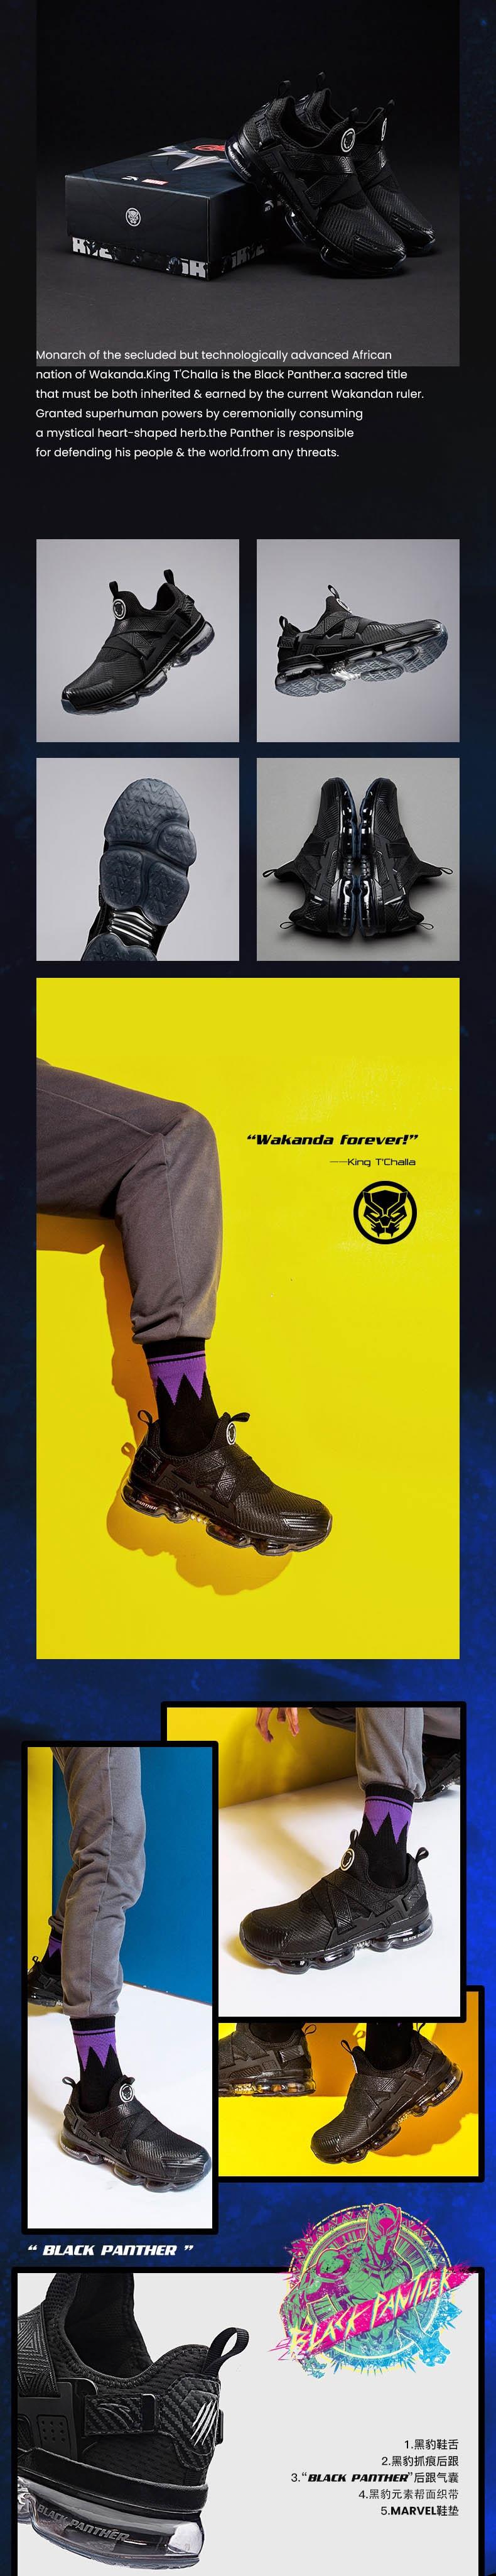 "Anta X Marvel ""BLACK PANTHER"" Running Shoes Anta SEEED Running Sneakers"